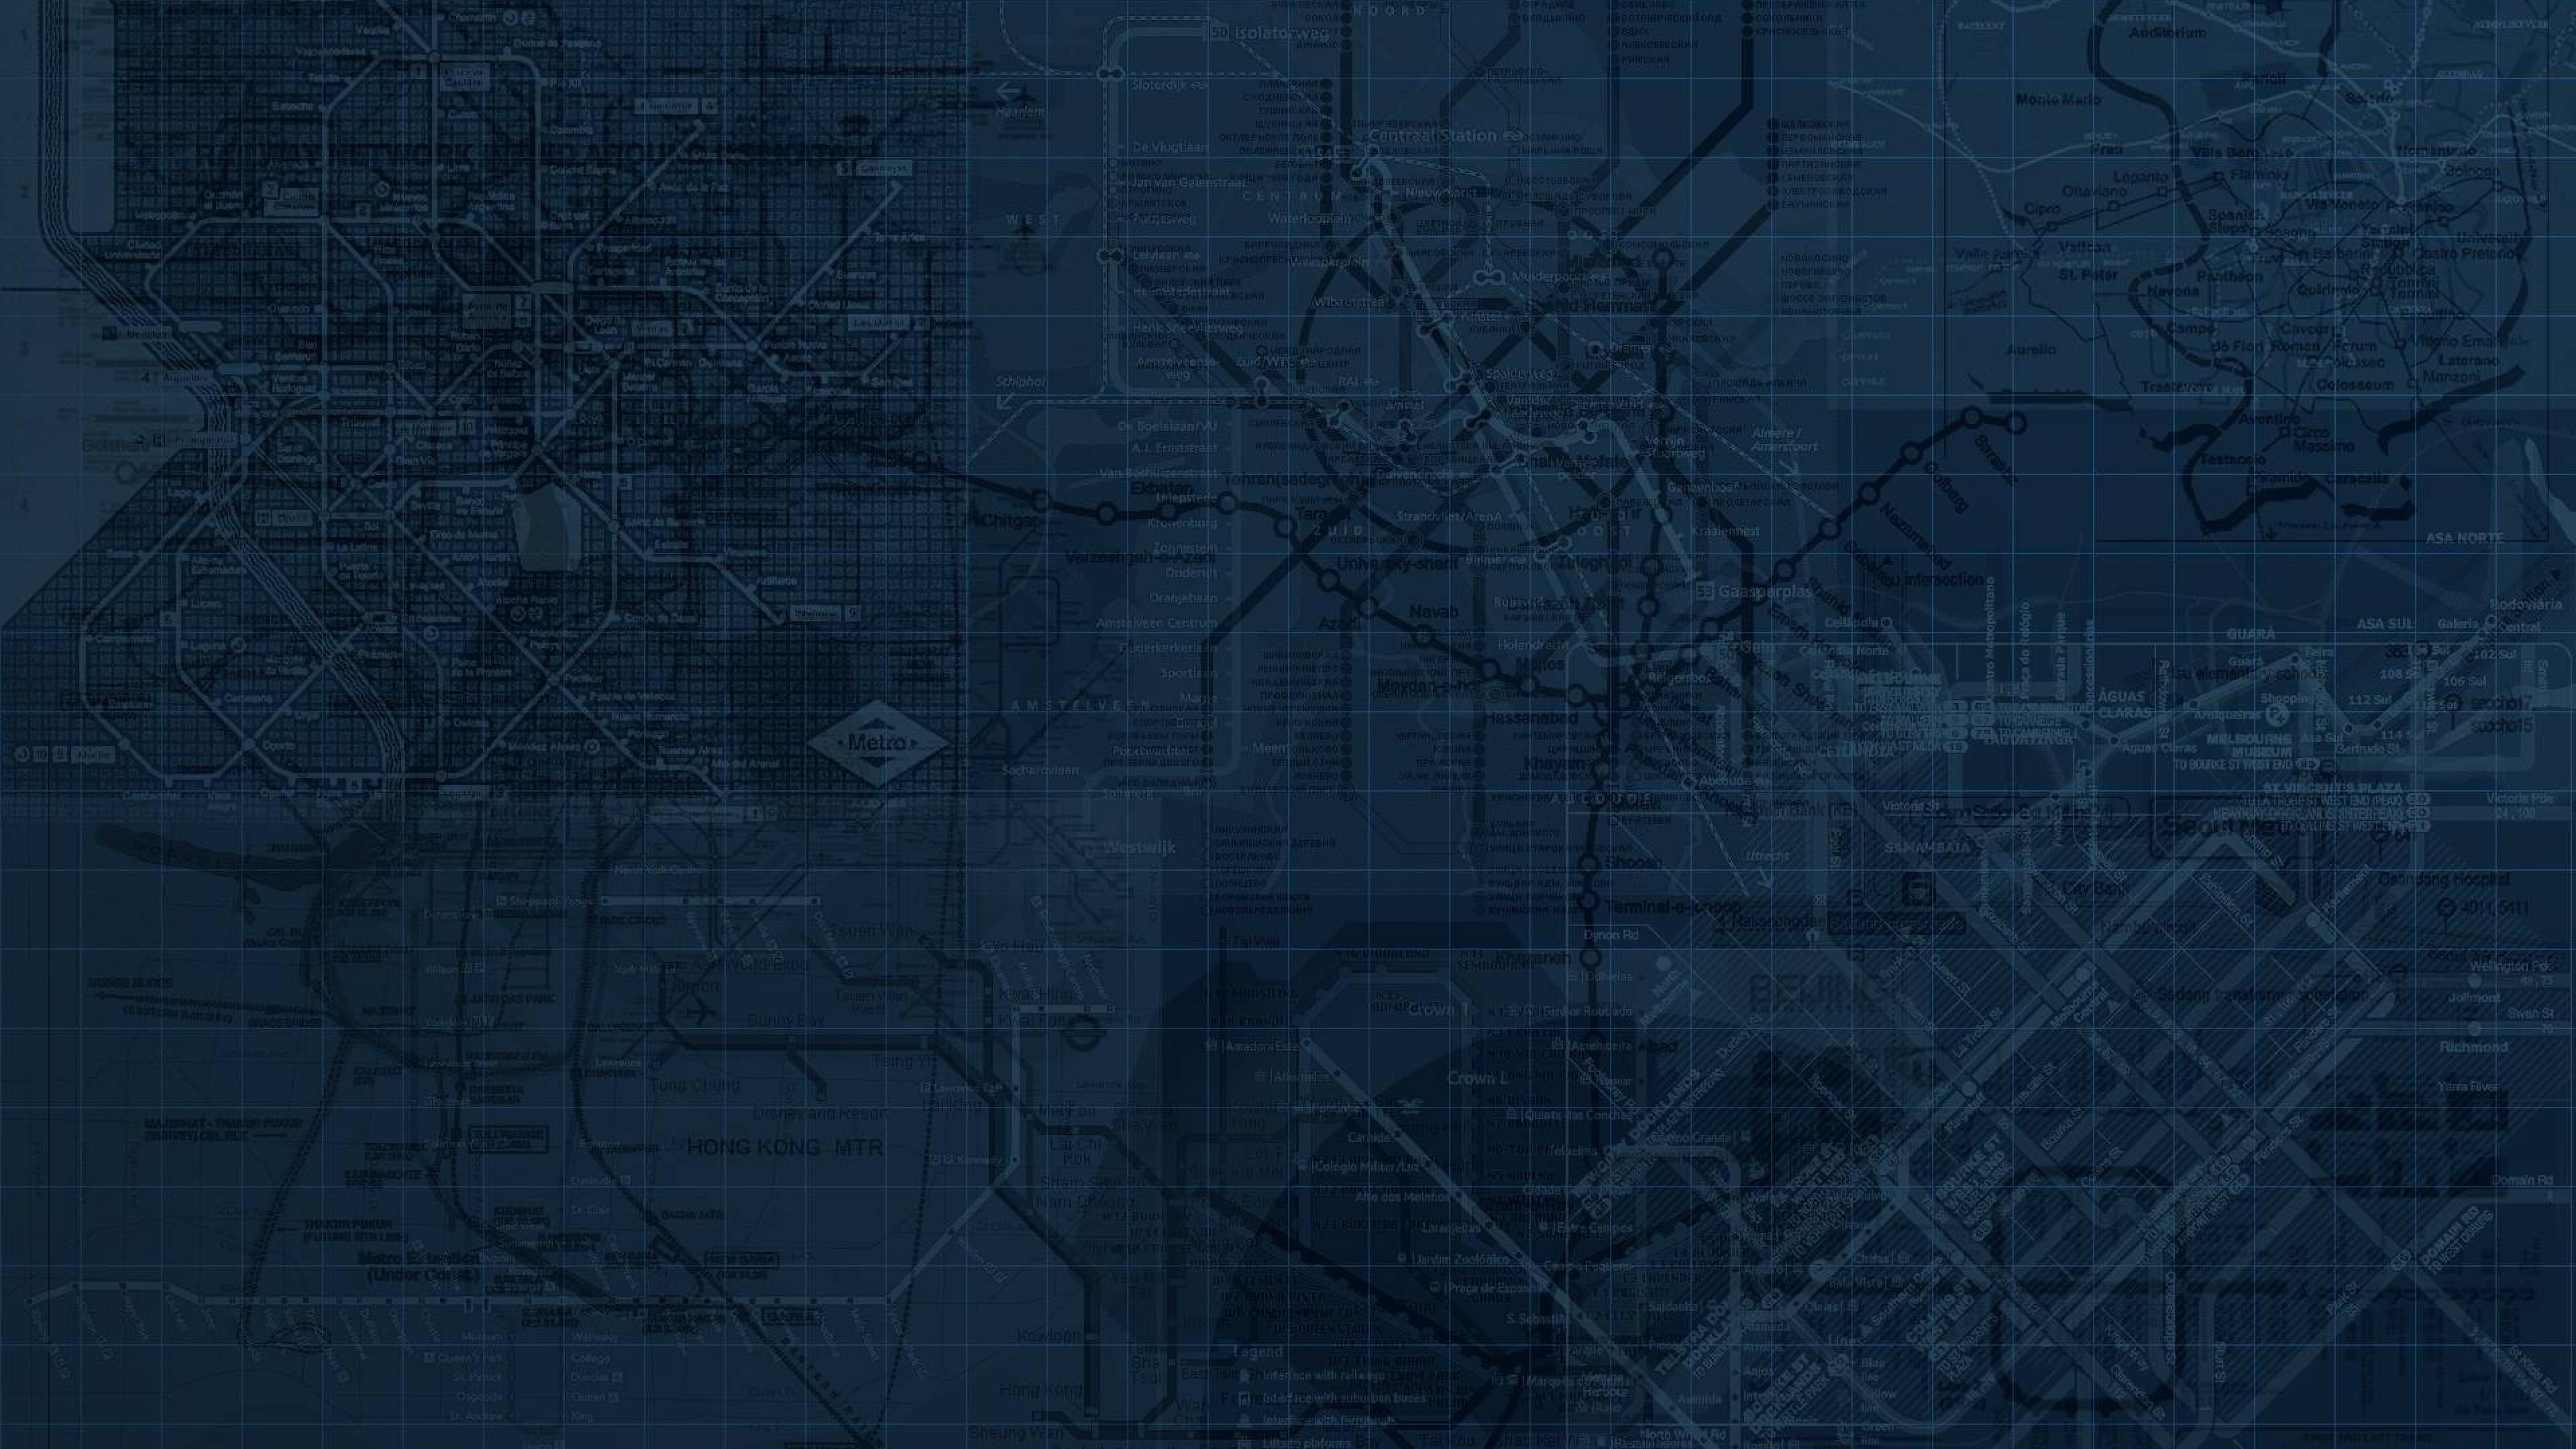 Line Texture Wallpaper : K texture wallpaper images